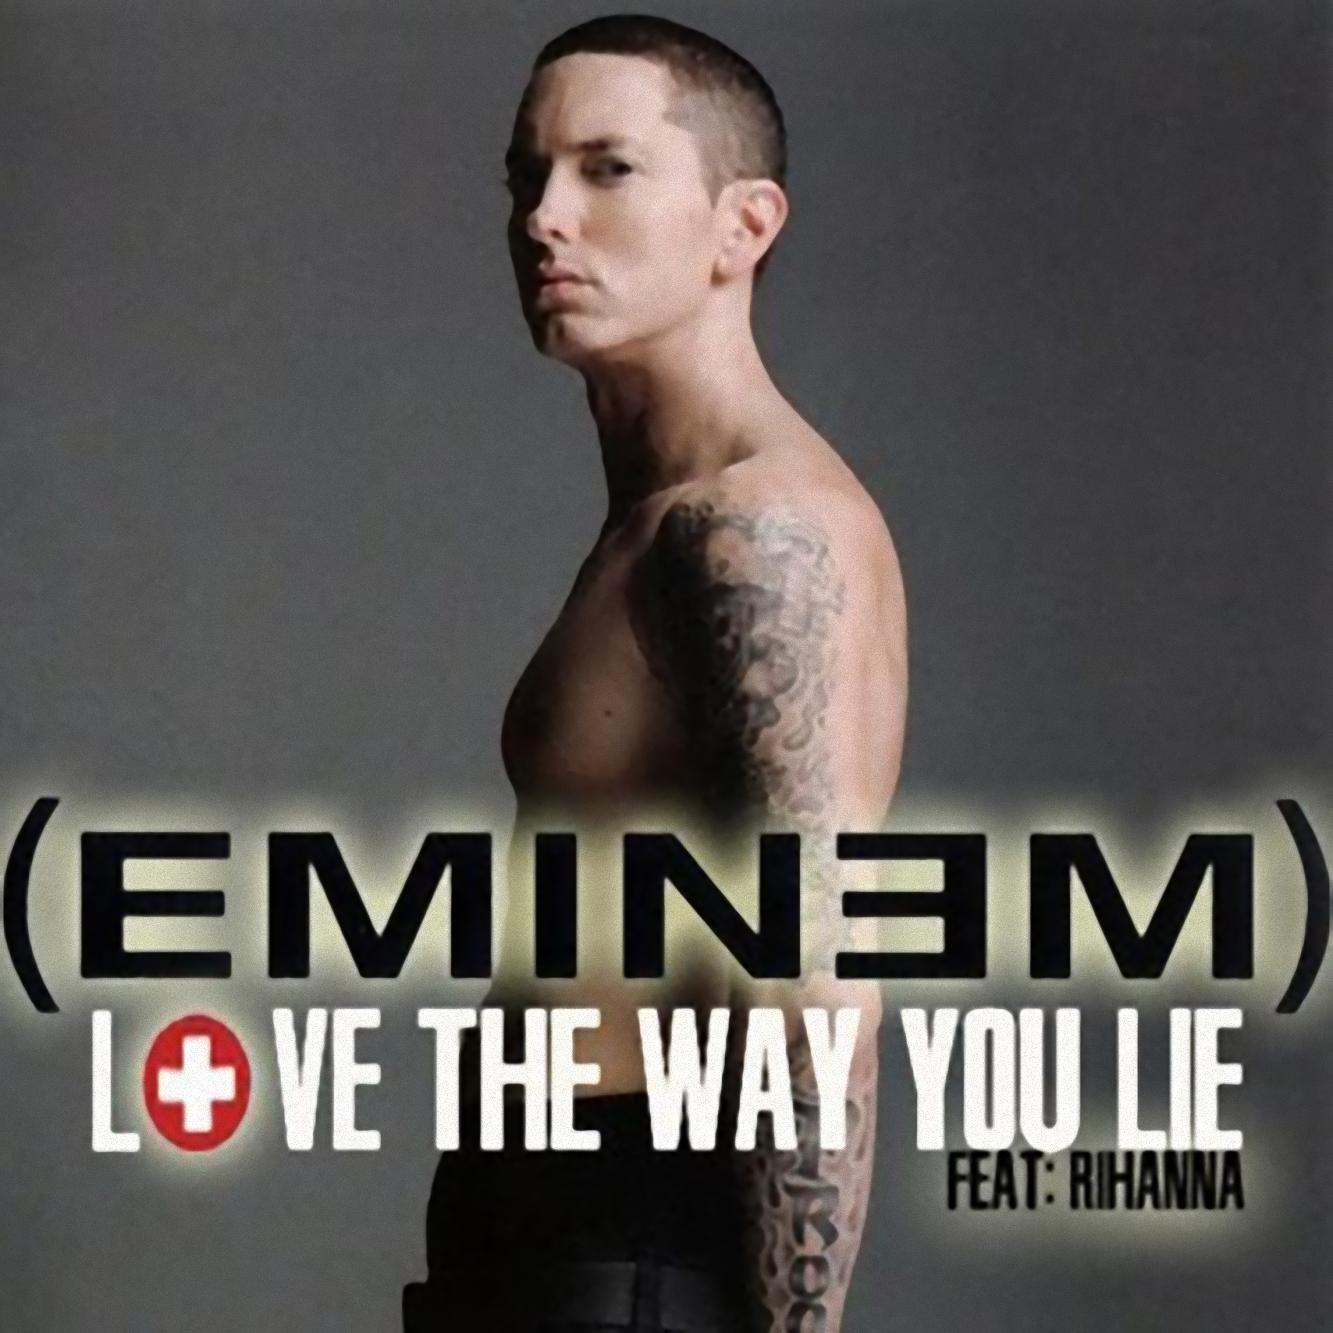 Eminem ft. Rihanna - Love The Way You Lie HD 1080p